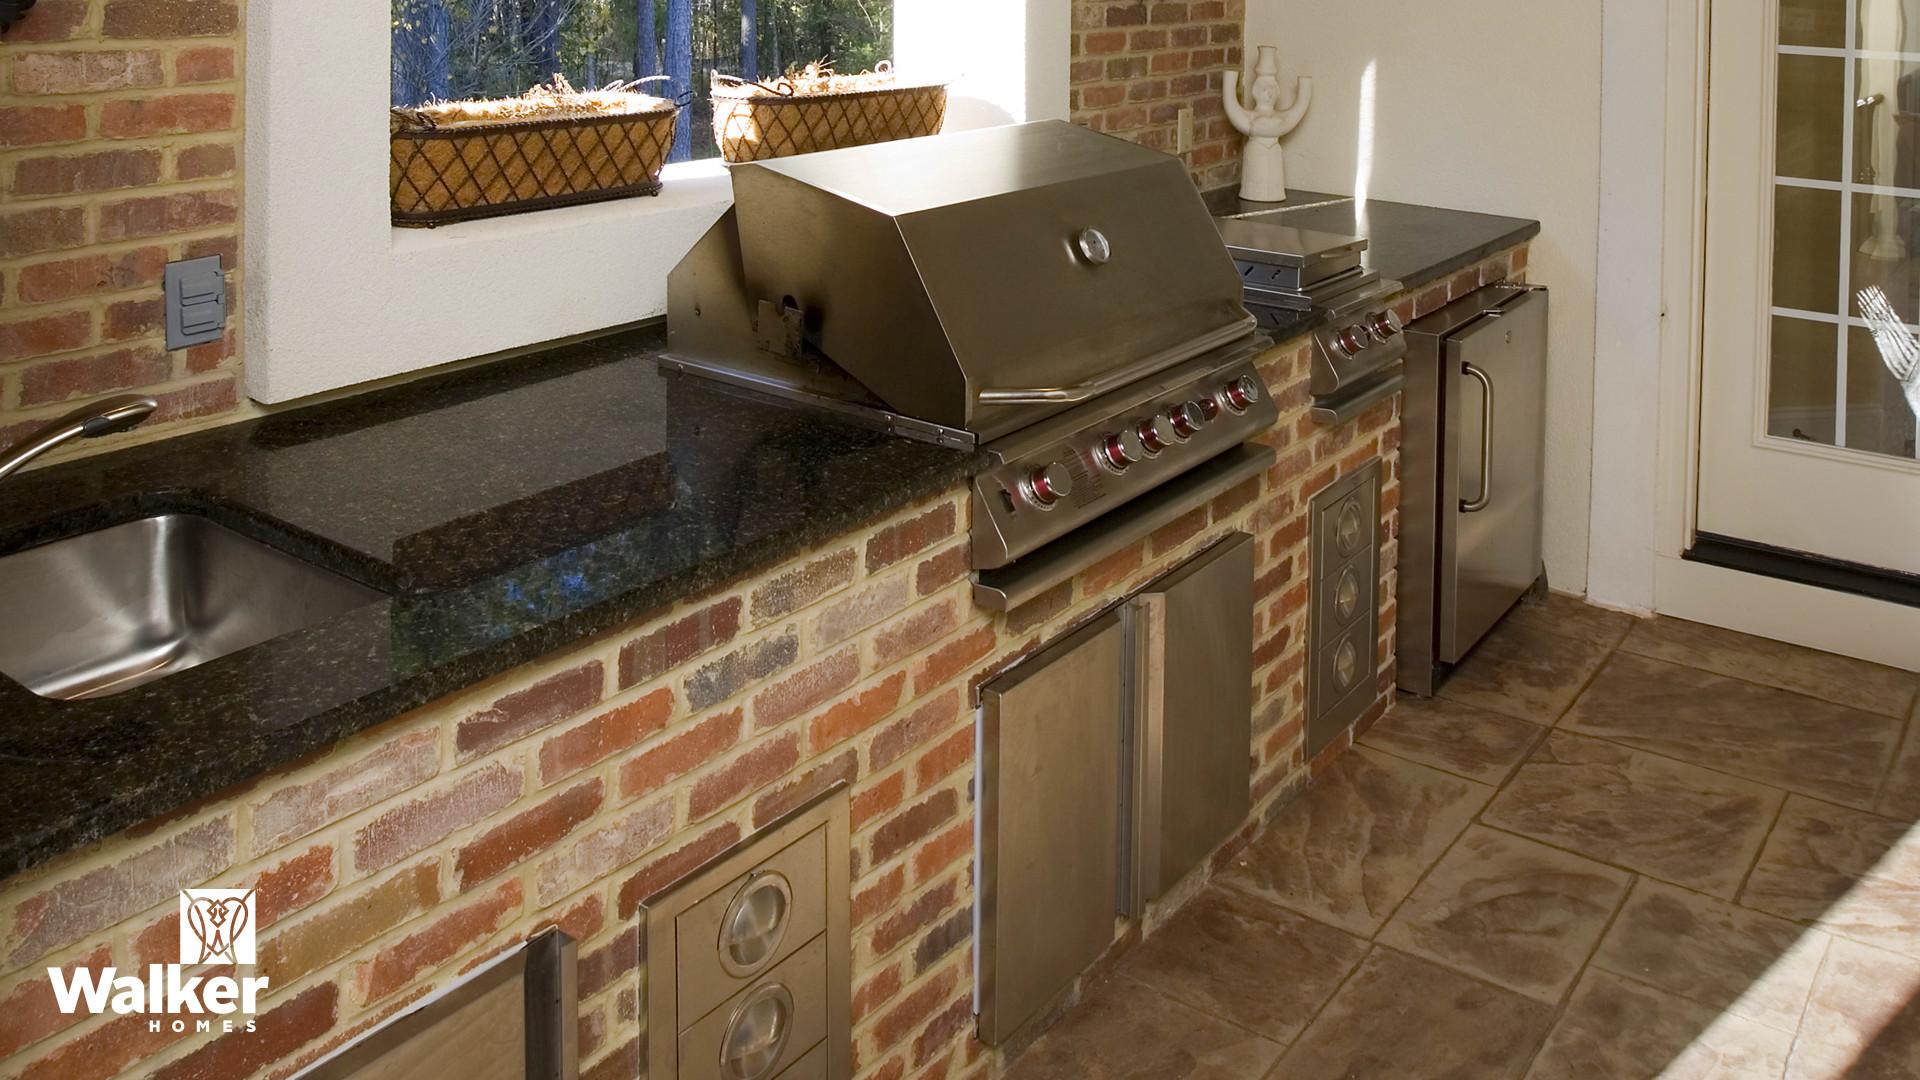 An Outdoor Kitchen from a custom home design by Walker Homes in Glen Allen, Virginia